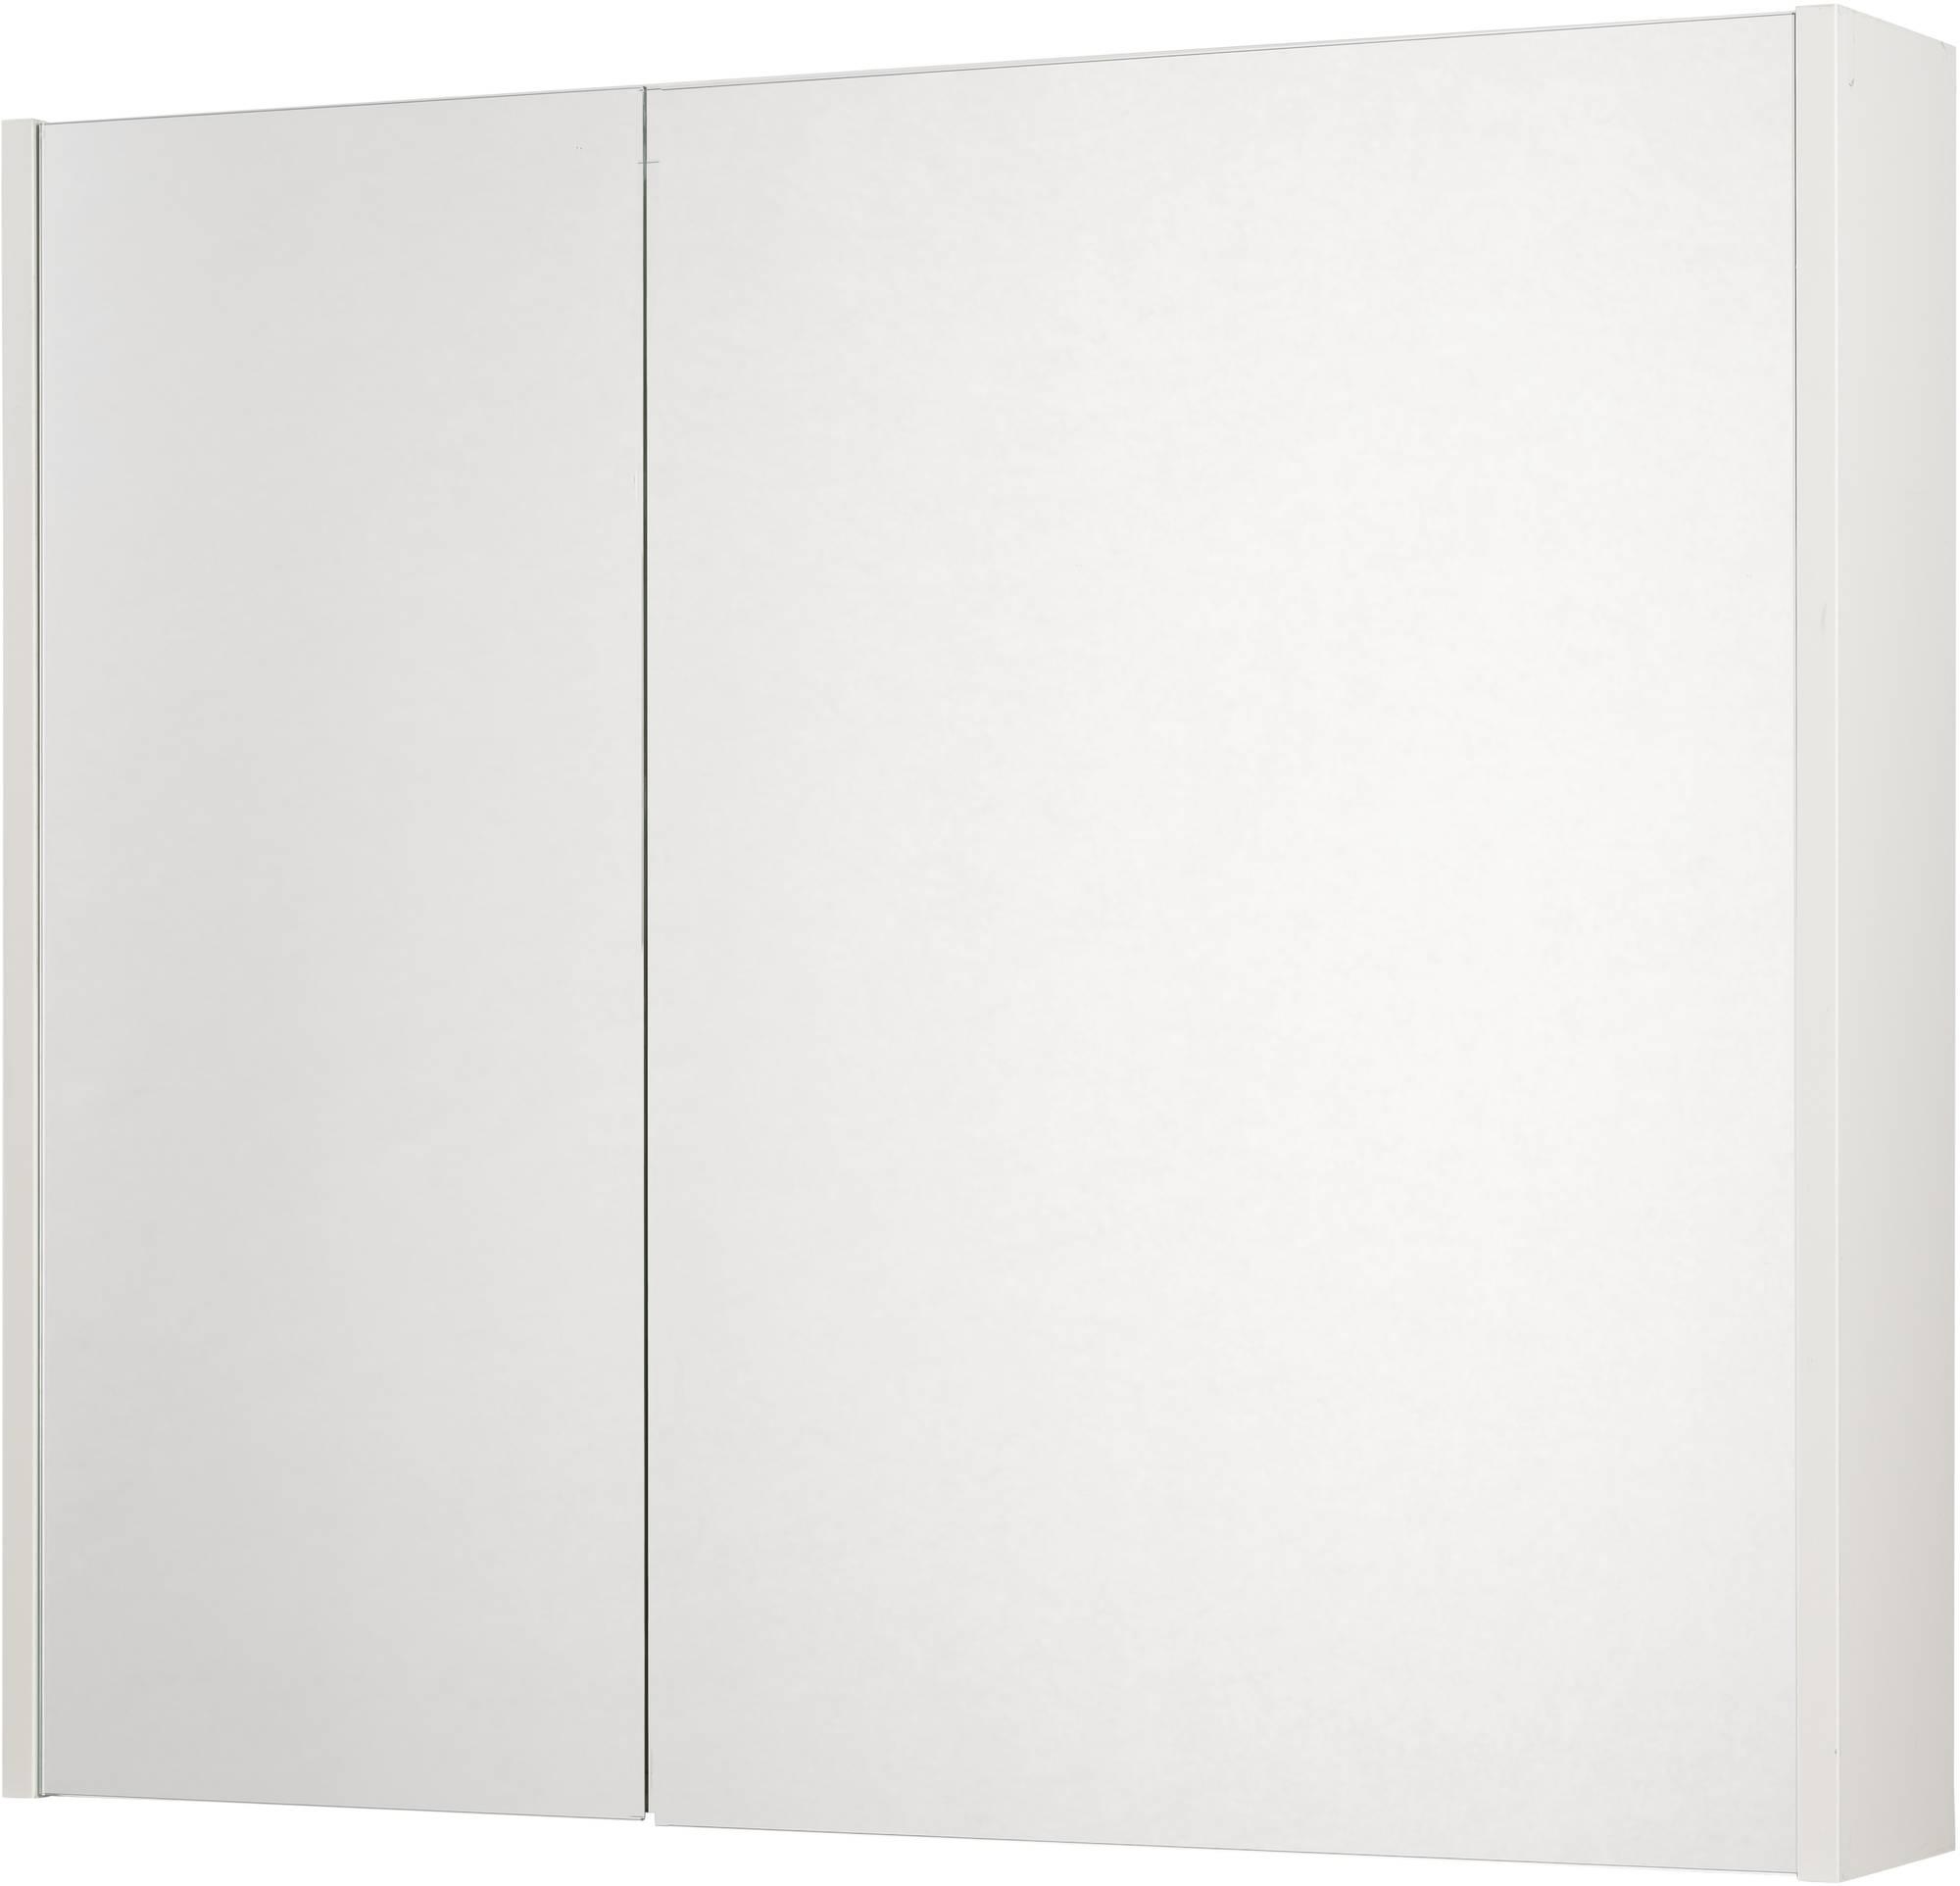 Saniselect Socan Spiegelkast 80x14x70 cm Glanzend Wit